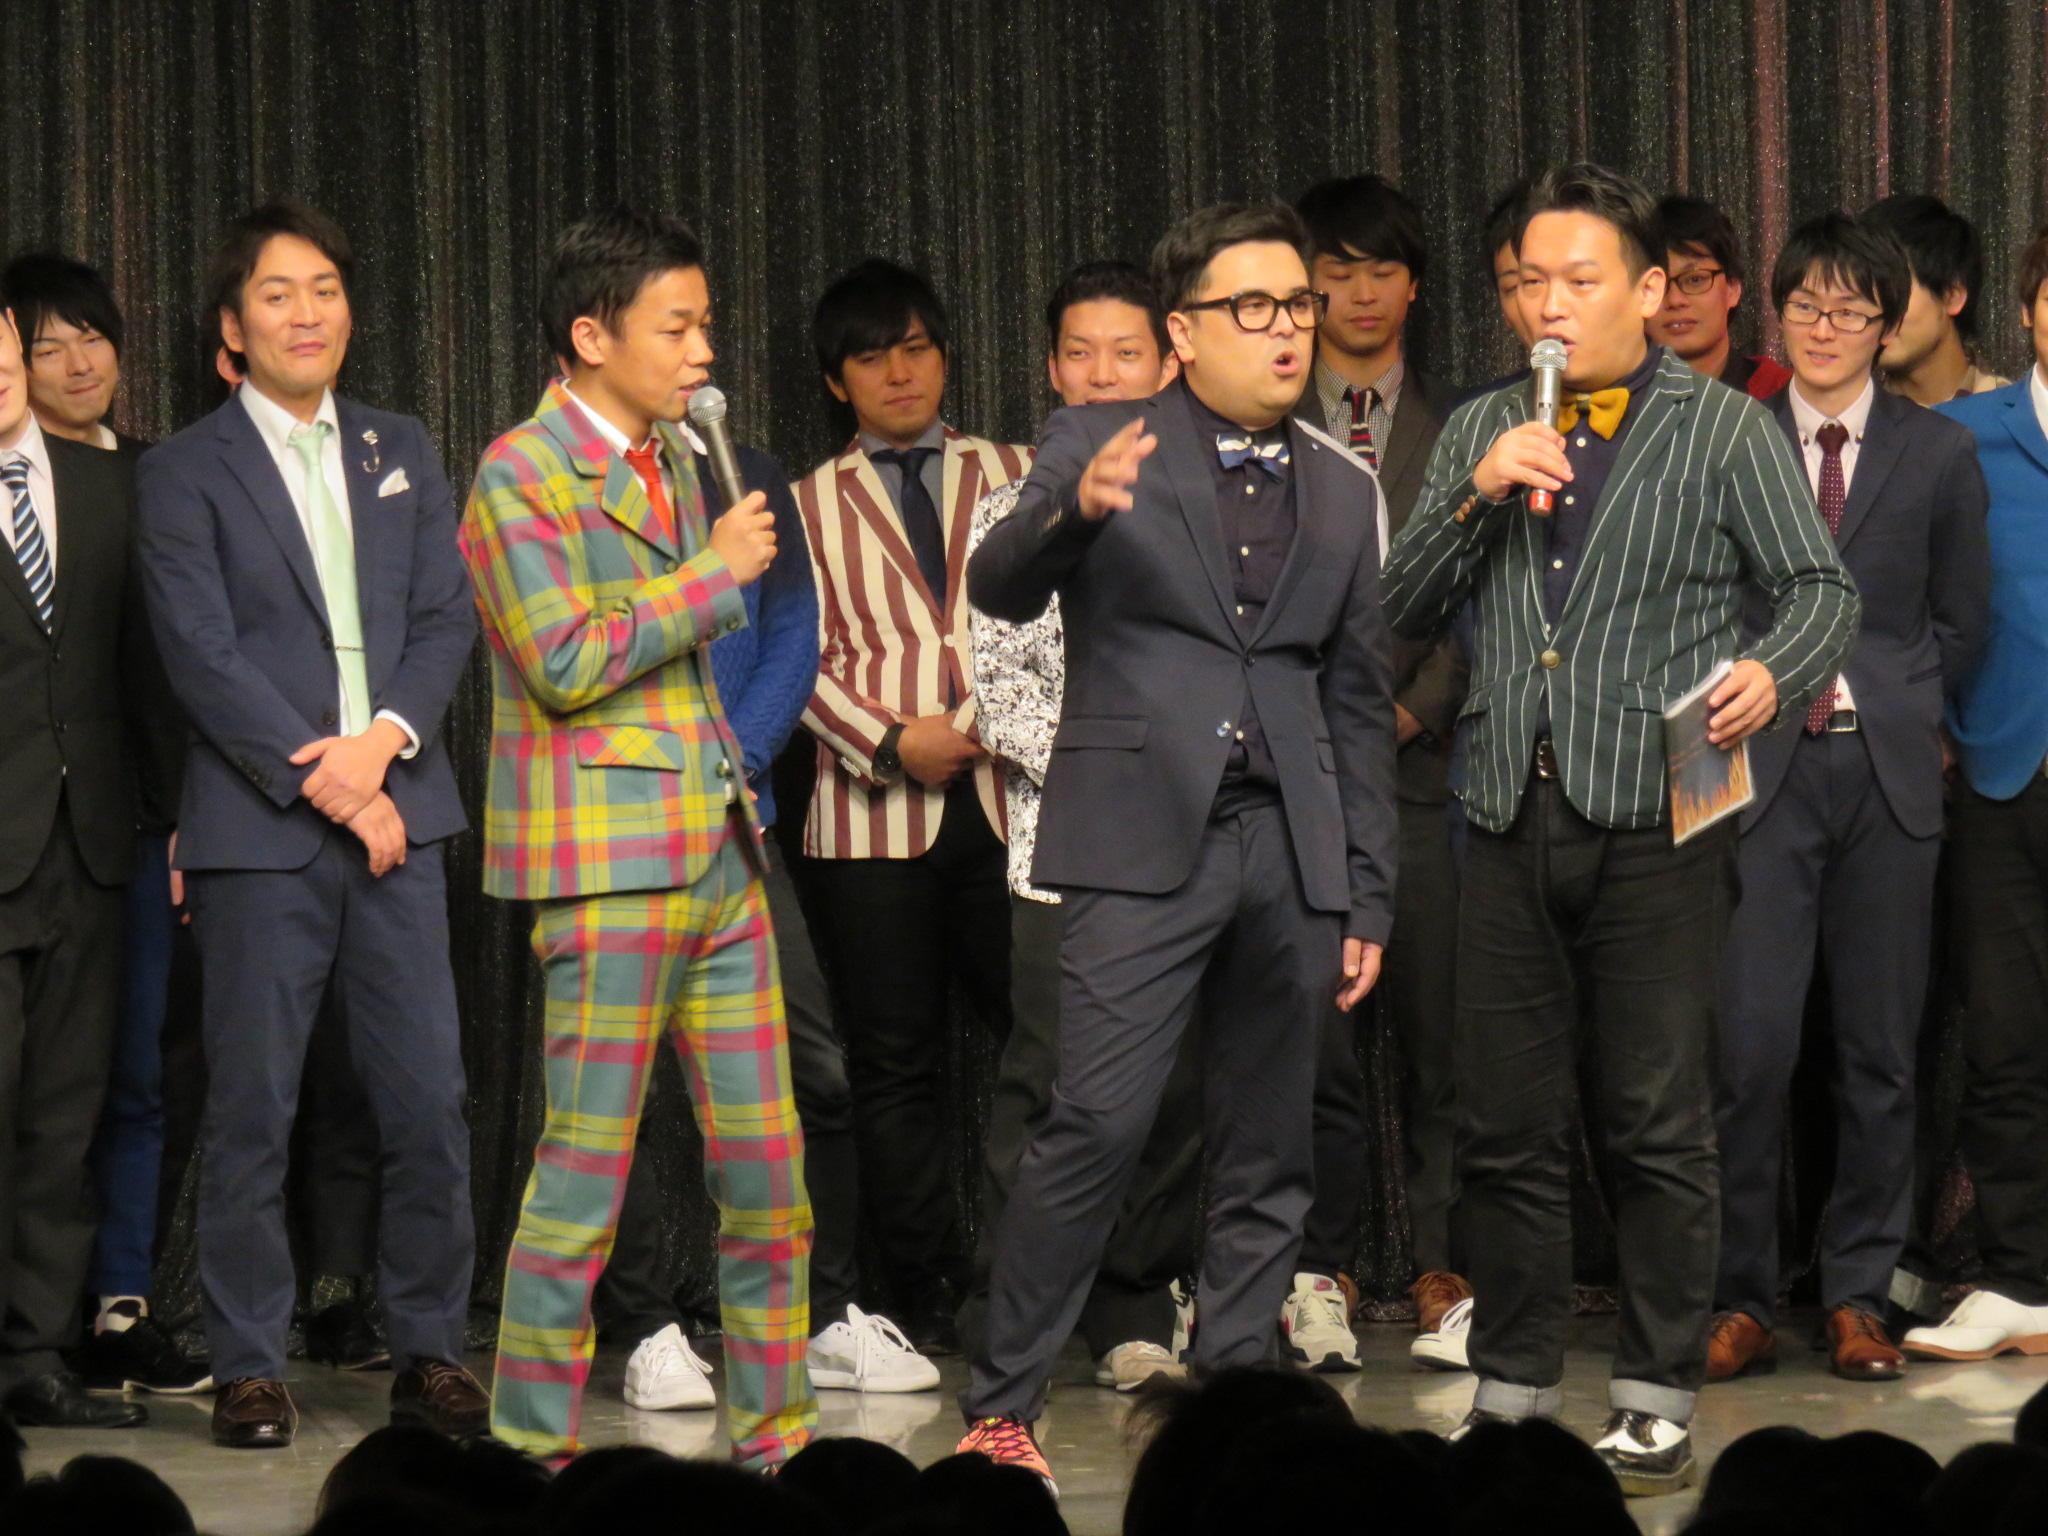 http://news.yoshimoto.co.jp/20151230165946-a2e65280228d5b911a6833436402def0e9bac734.jpg